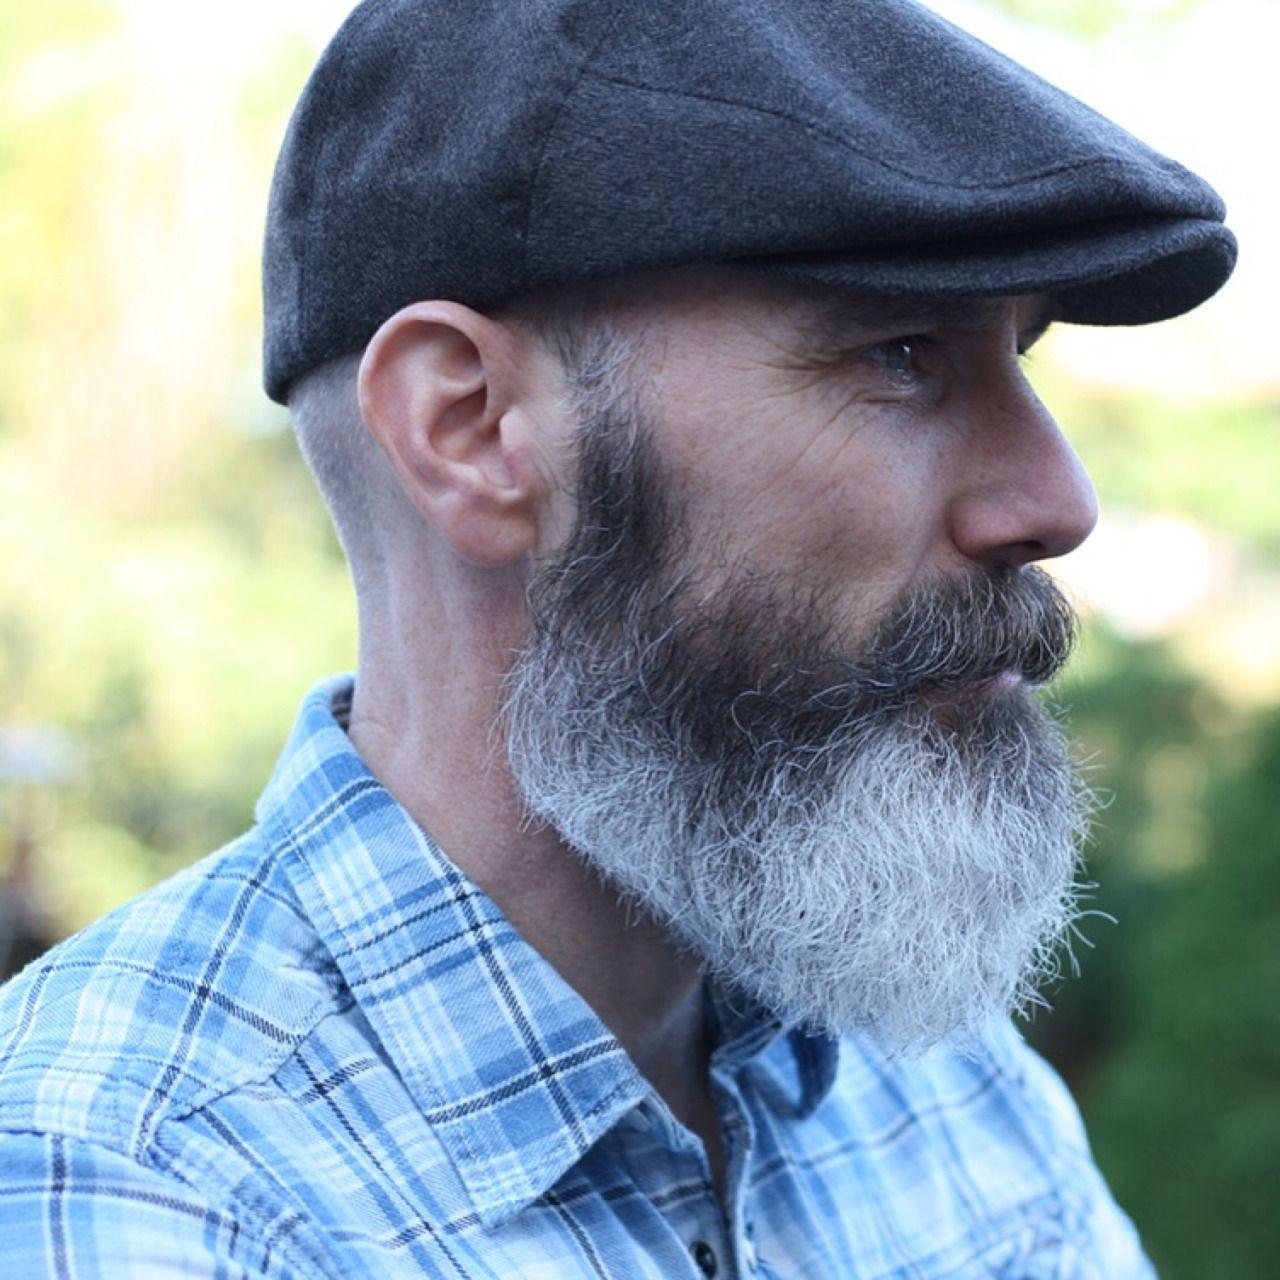 quaker style beard. Black Bedroom Furniture Sets. Home Design Ideas